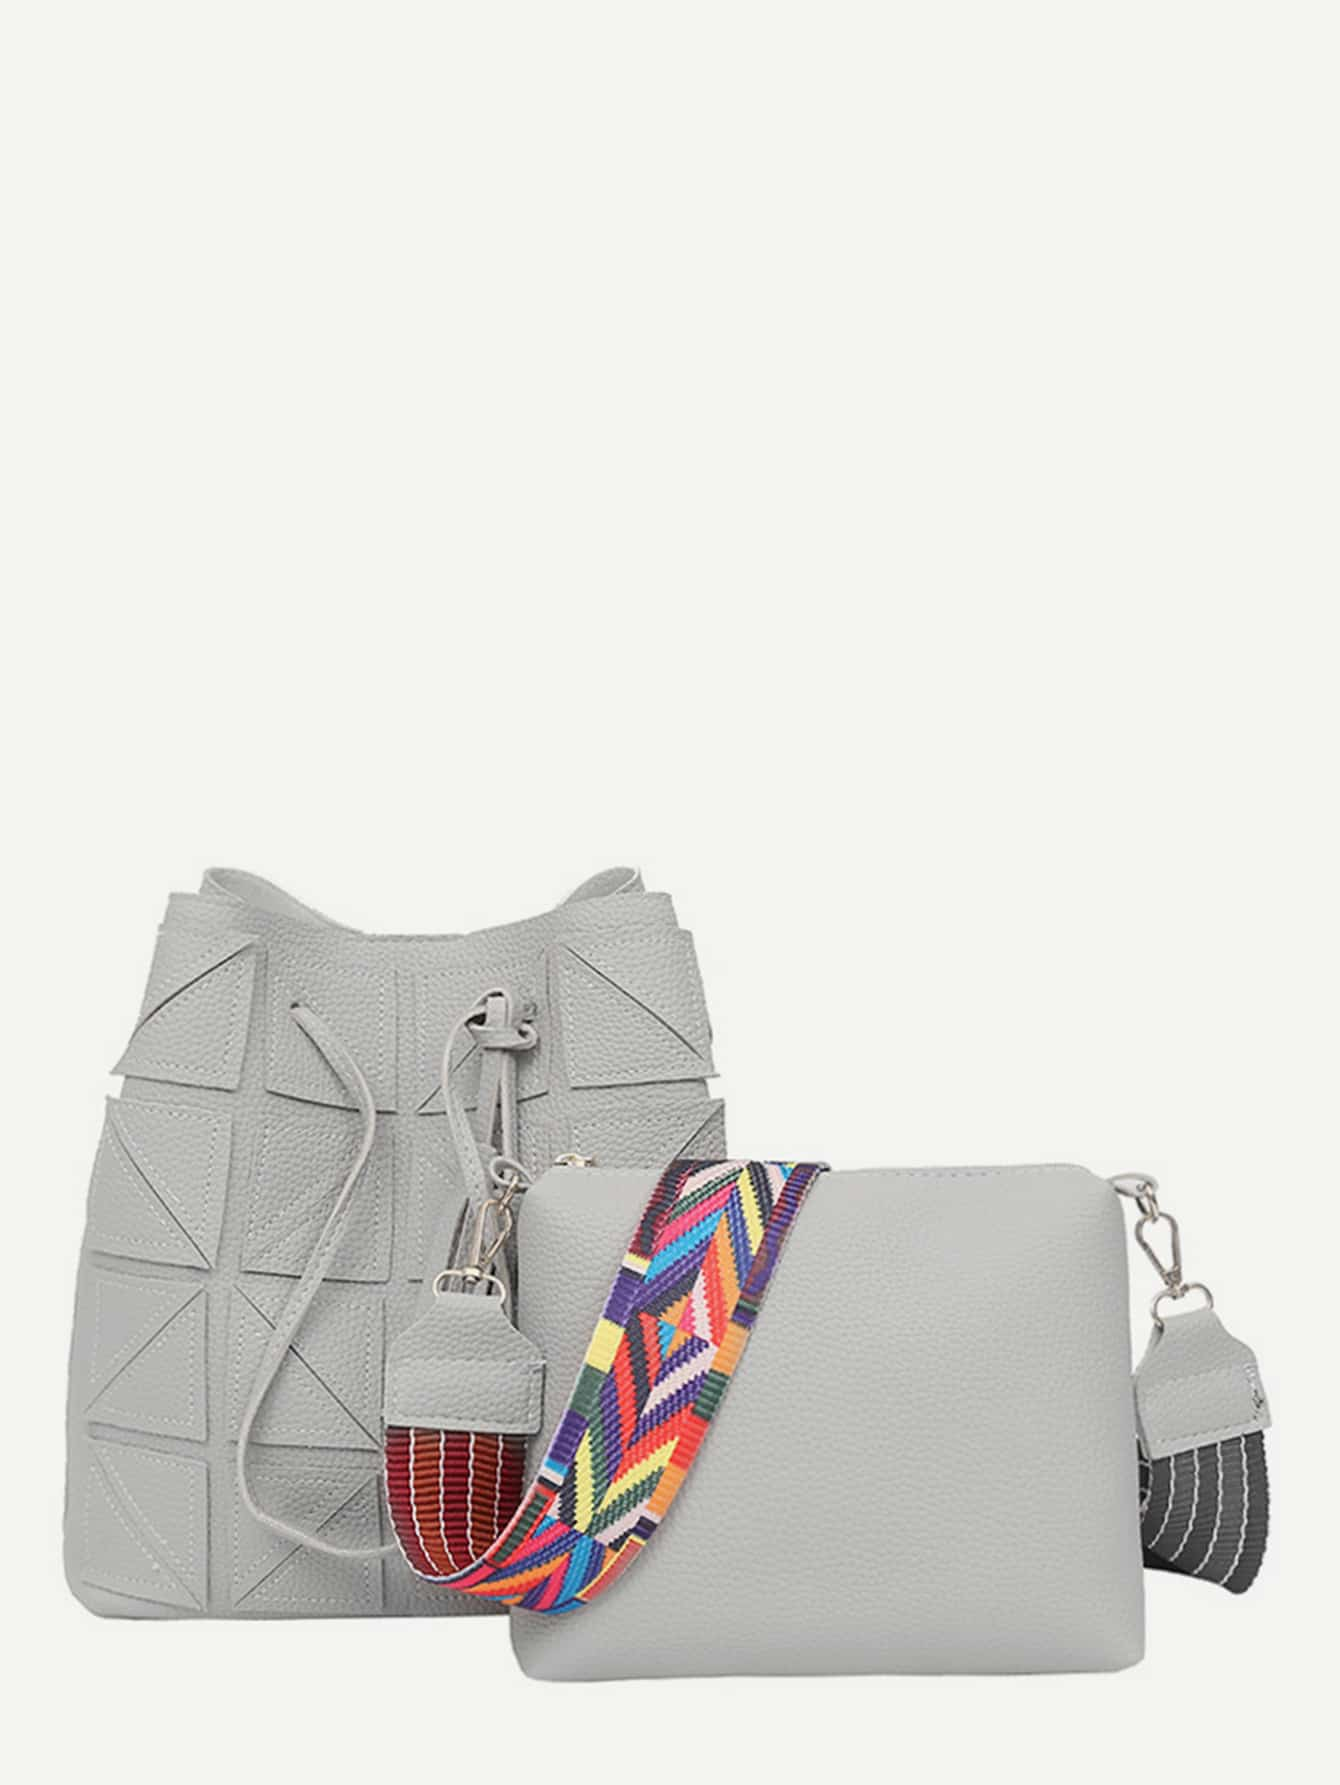 Фото - Tassel Decorated Tote Bag & Shoulder Bag Set 2017 luxury brand women handbag oil wax leather vintage casual tote large capacity shoulder bag big ladies messenger bag bolsa